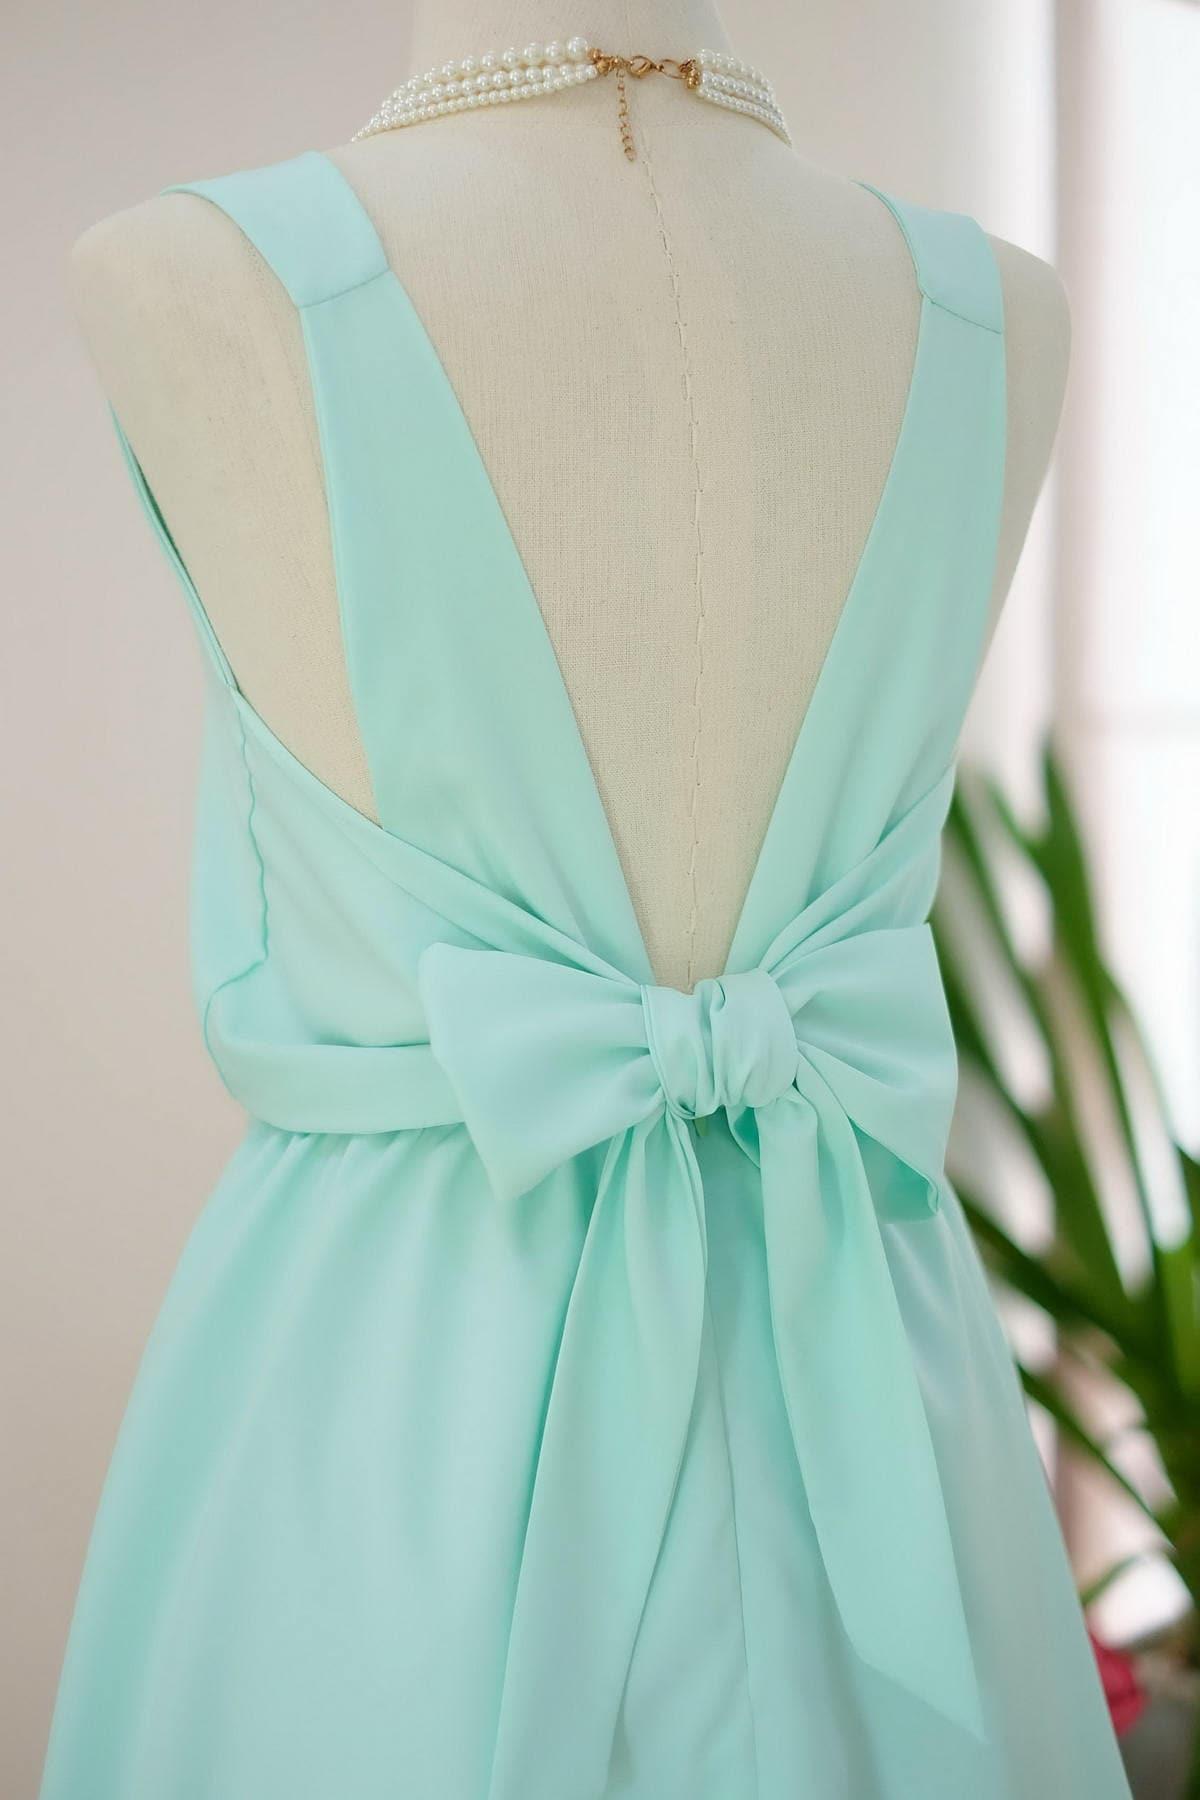 Grüne Brautjungfer Kleid Mint grünes Kleid Mint Partei Kleid